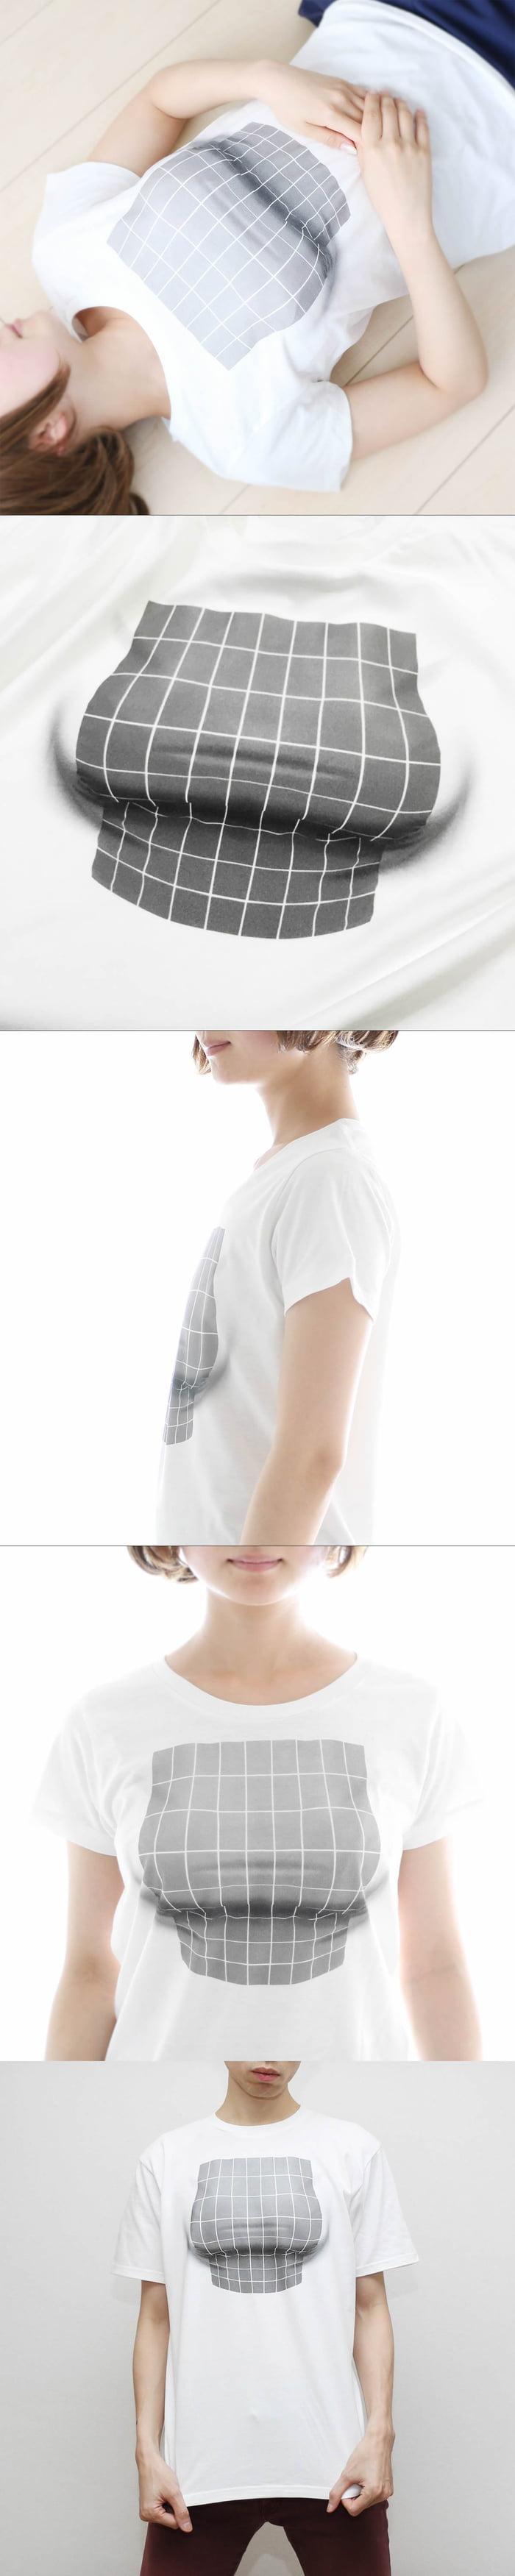 3d boobies optical illusion tee